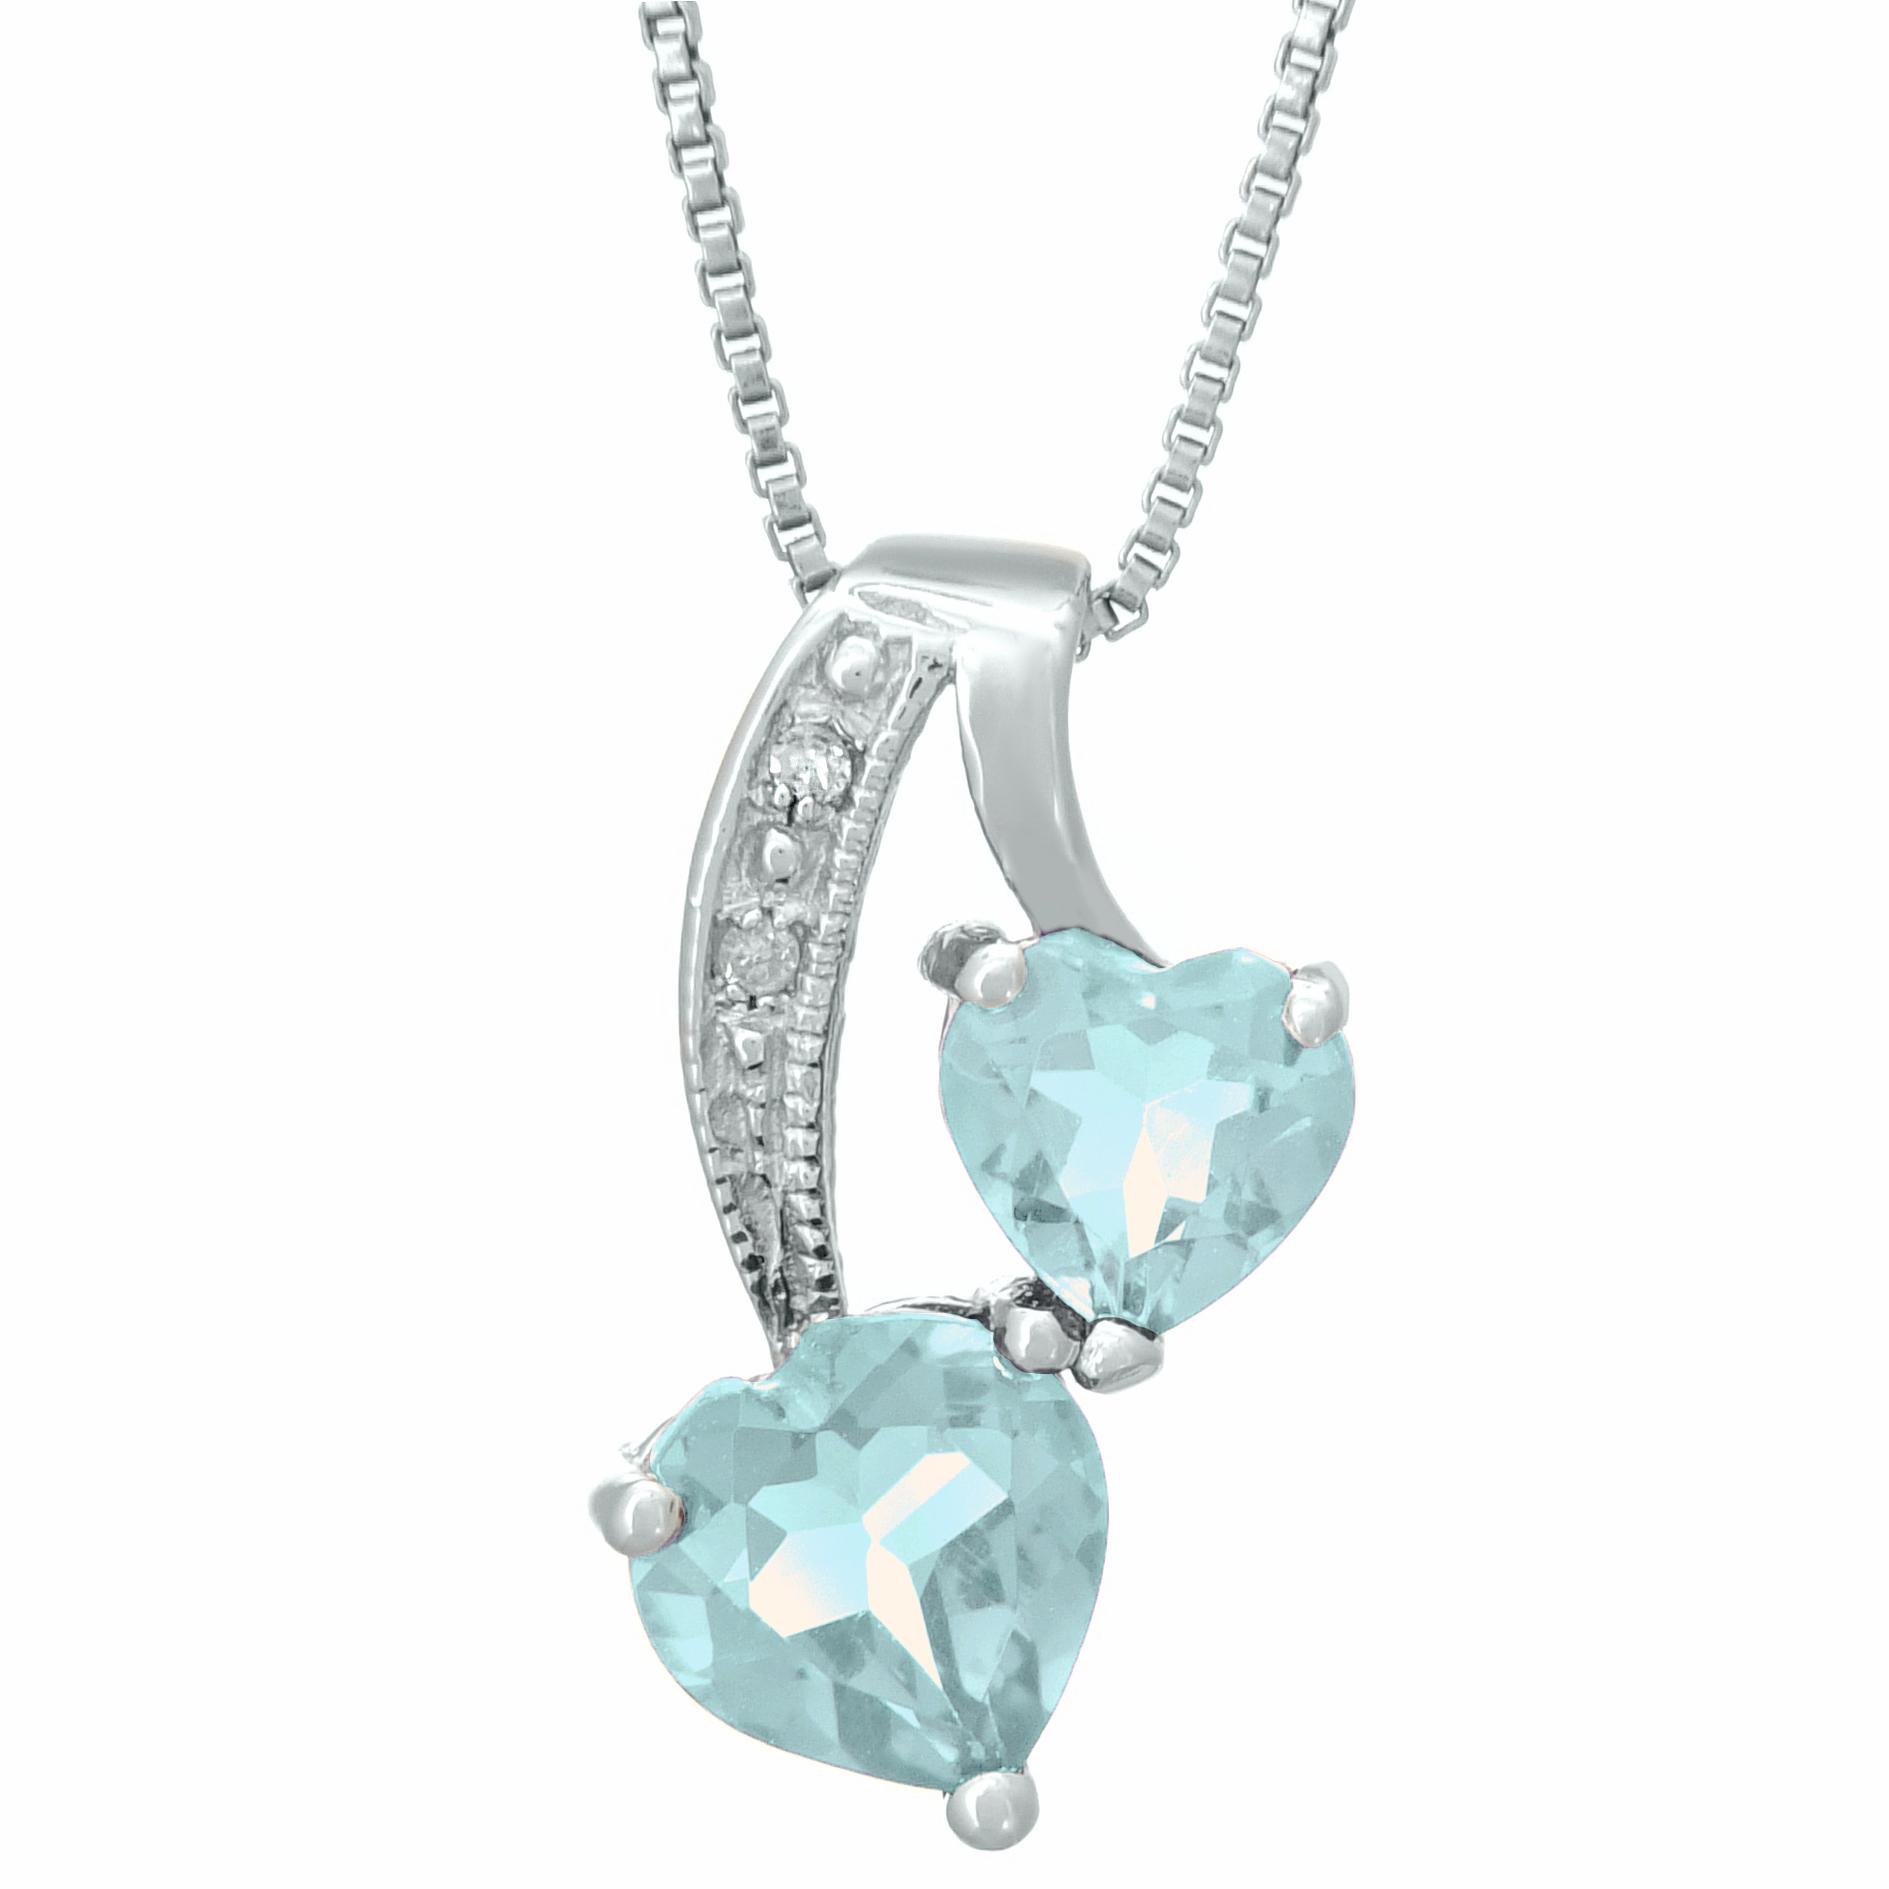 90 ct sky blue aquamarine sterling silver